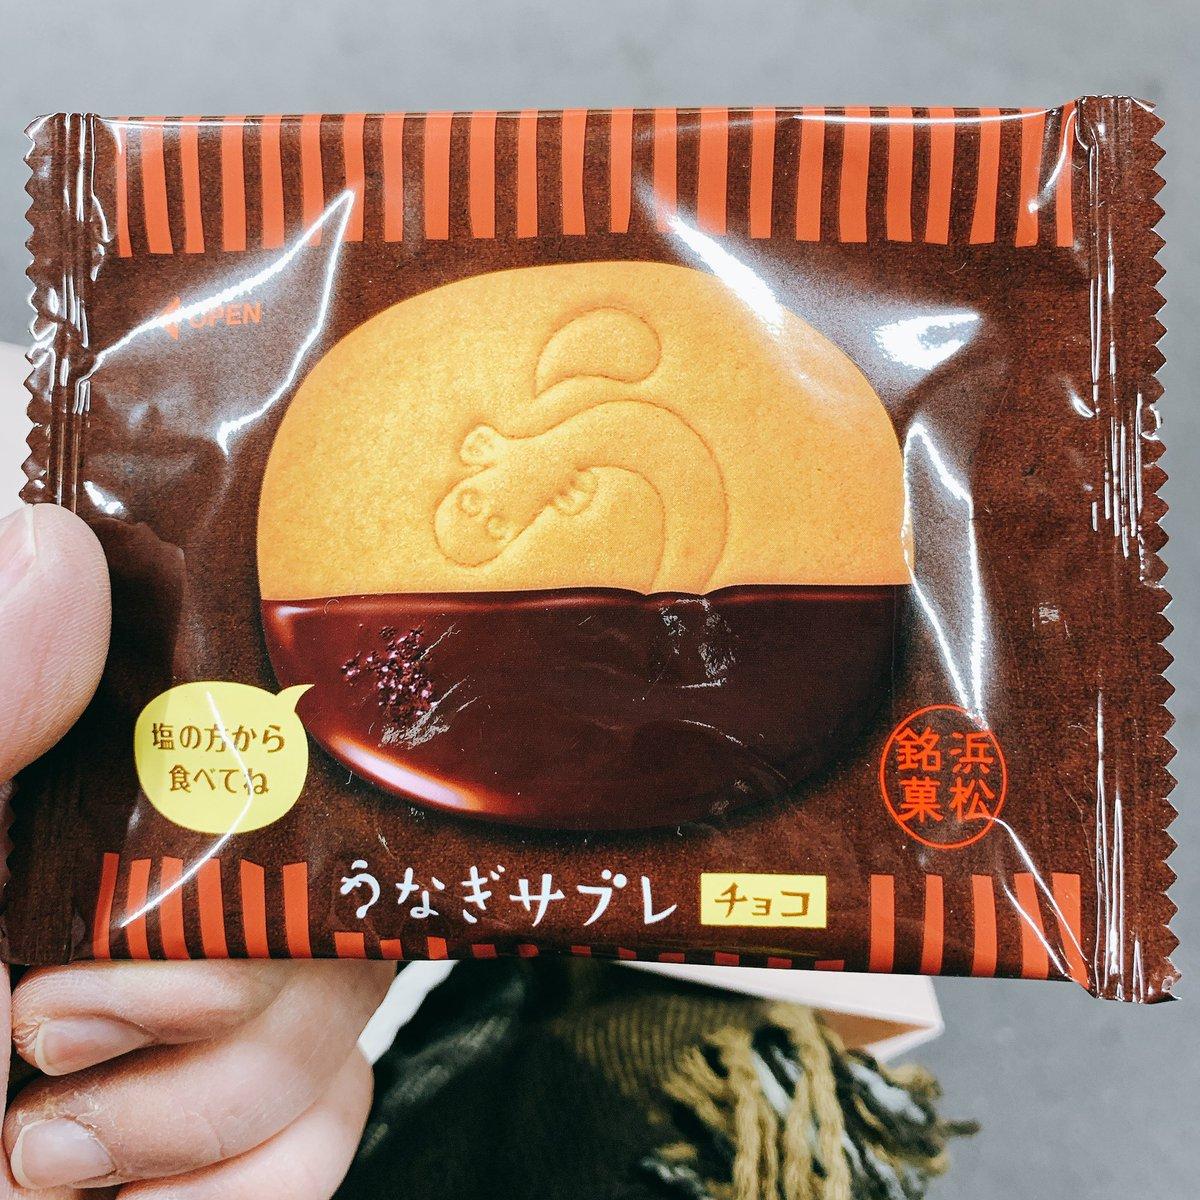 test ツイッターメディア - 関東で春華堂のお菓子を見るとは…(県外民の為の注釈:うなぎパイ作ってるお菓子屋さんだよ) https://t.co/NTrz6rbTPu